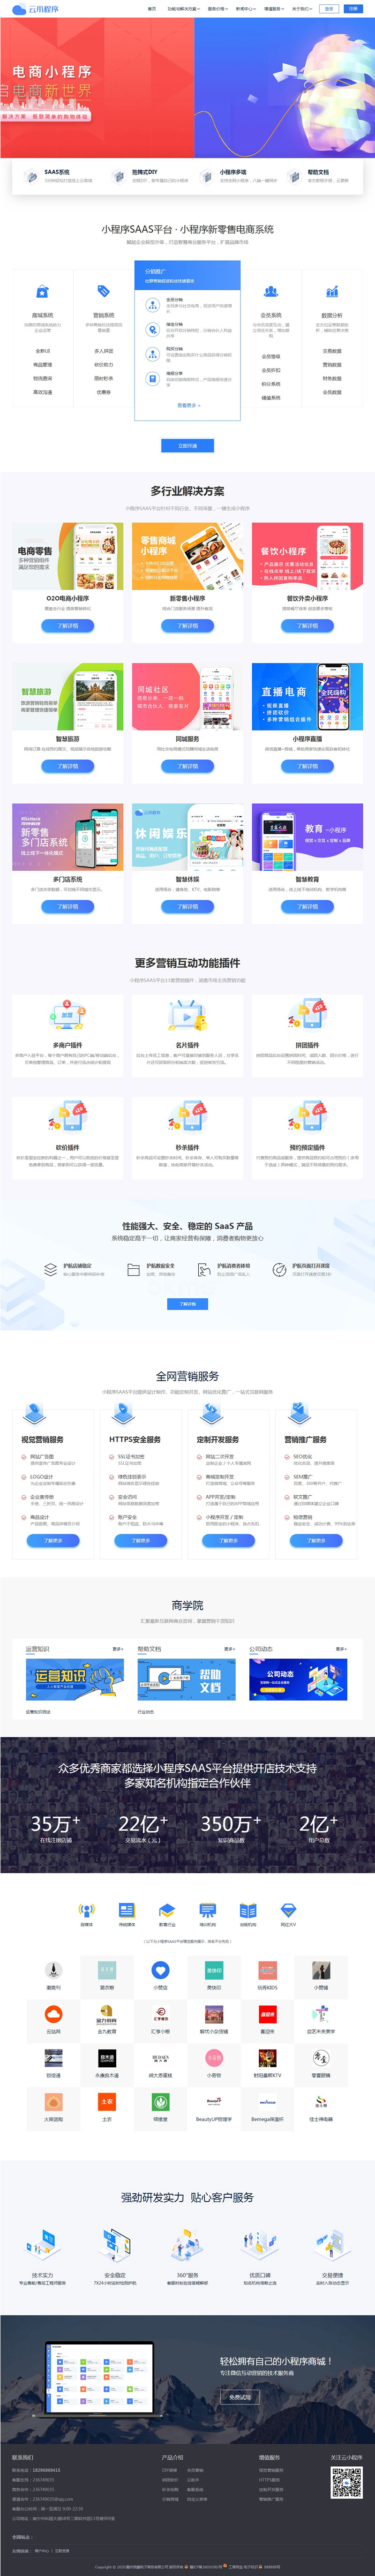 PbootCms微信小程序社交电商软件公司官网源码